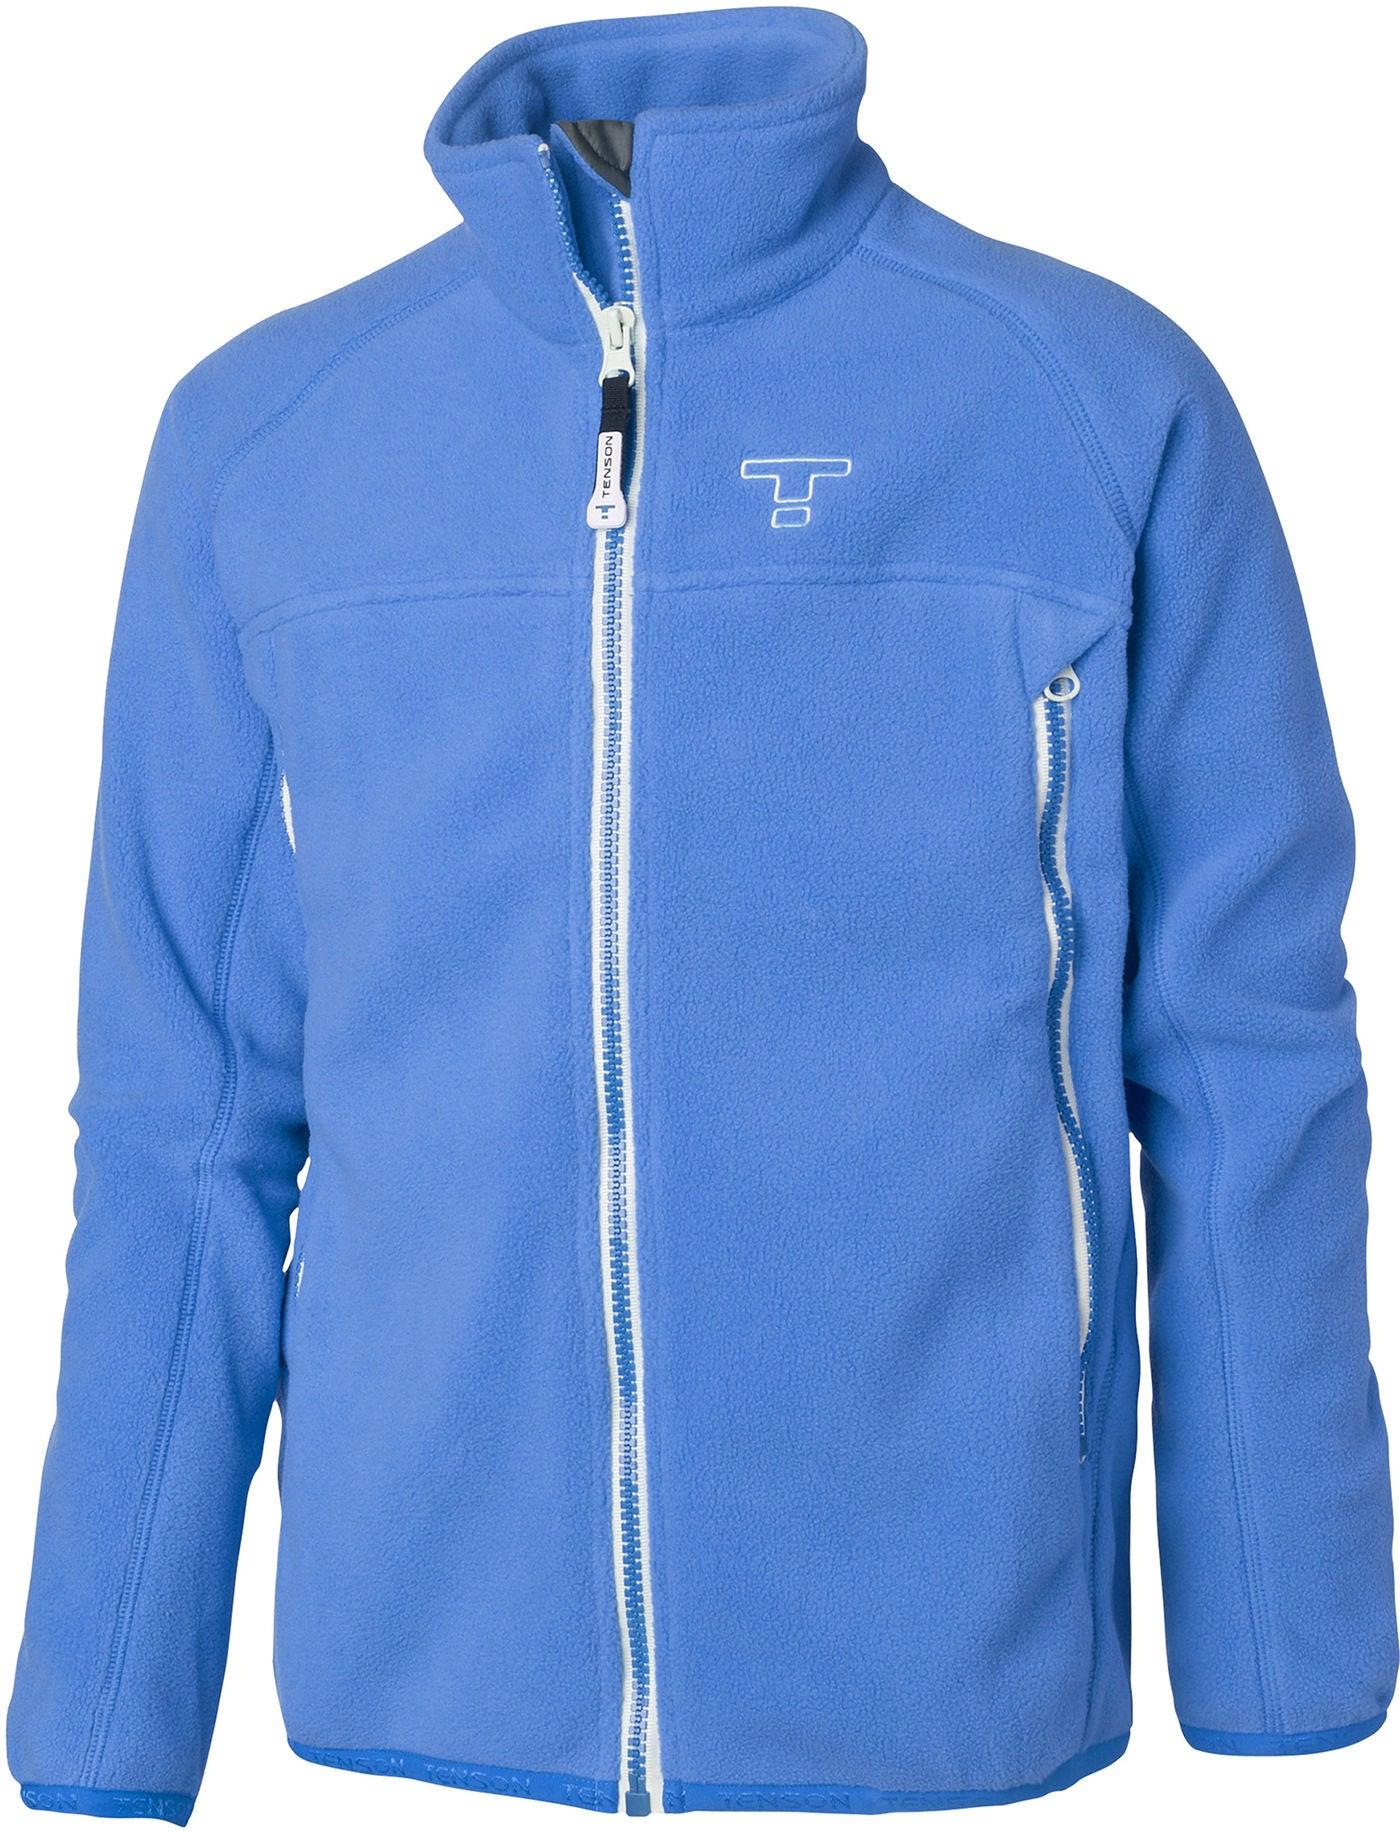 Tenson Moment Fleece, Blue 134-140